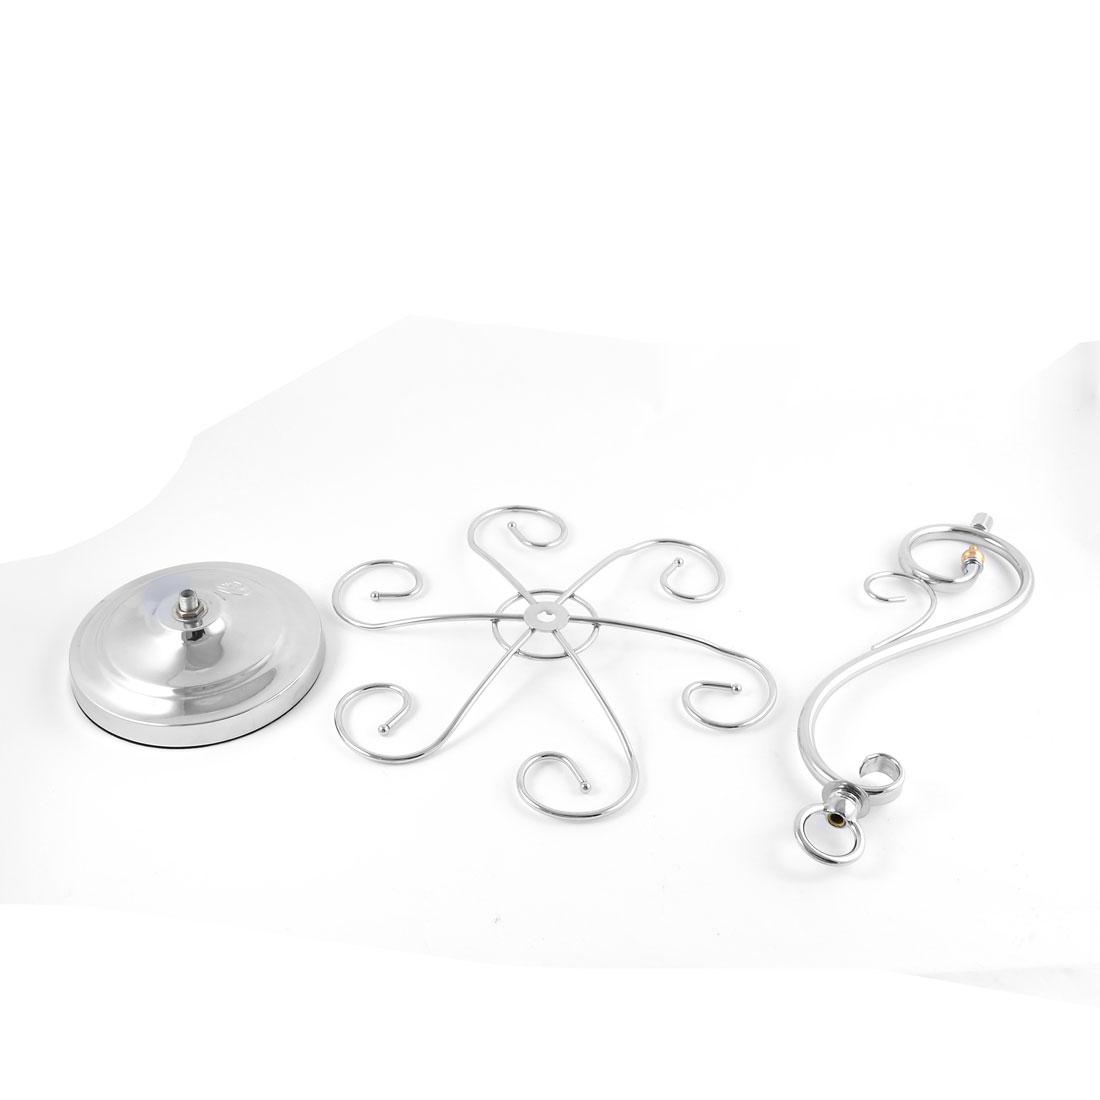 Metal Elegant Tabletop 6 Wine Glass Drying Rack Ring Display Stand Silver Tone 2